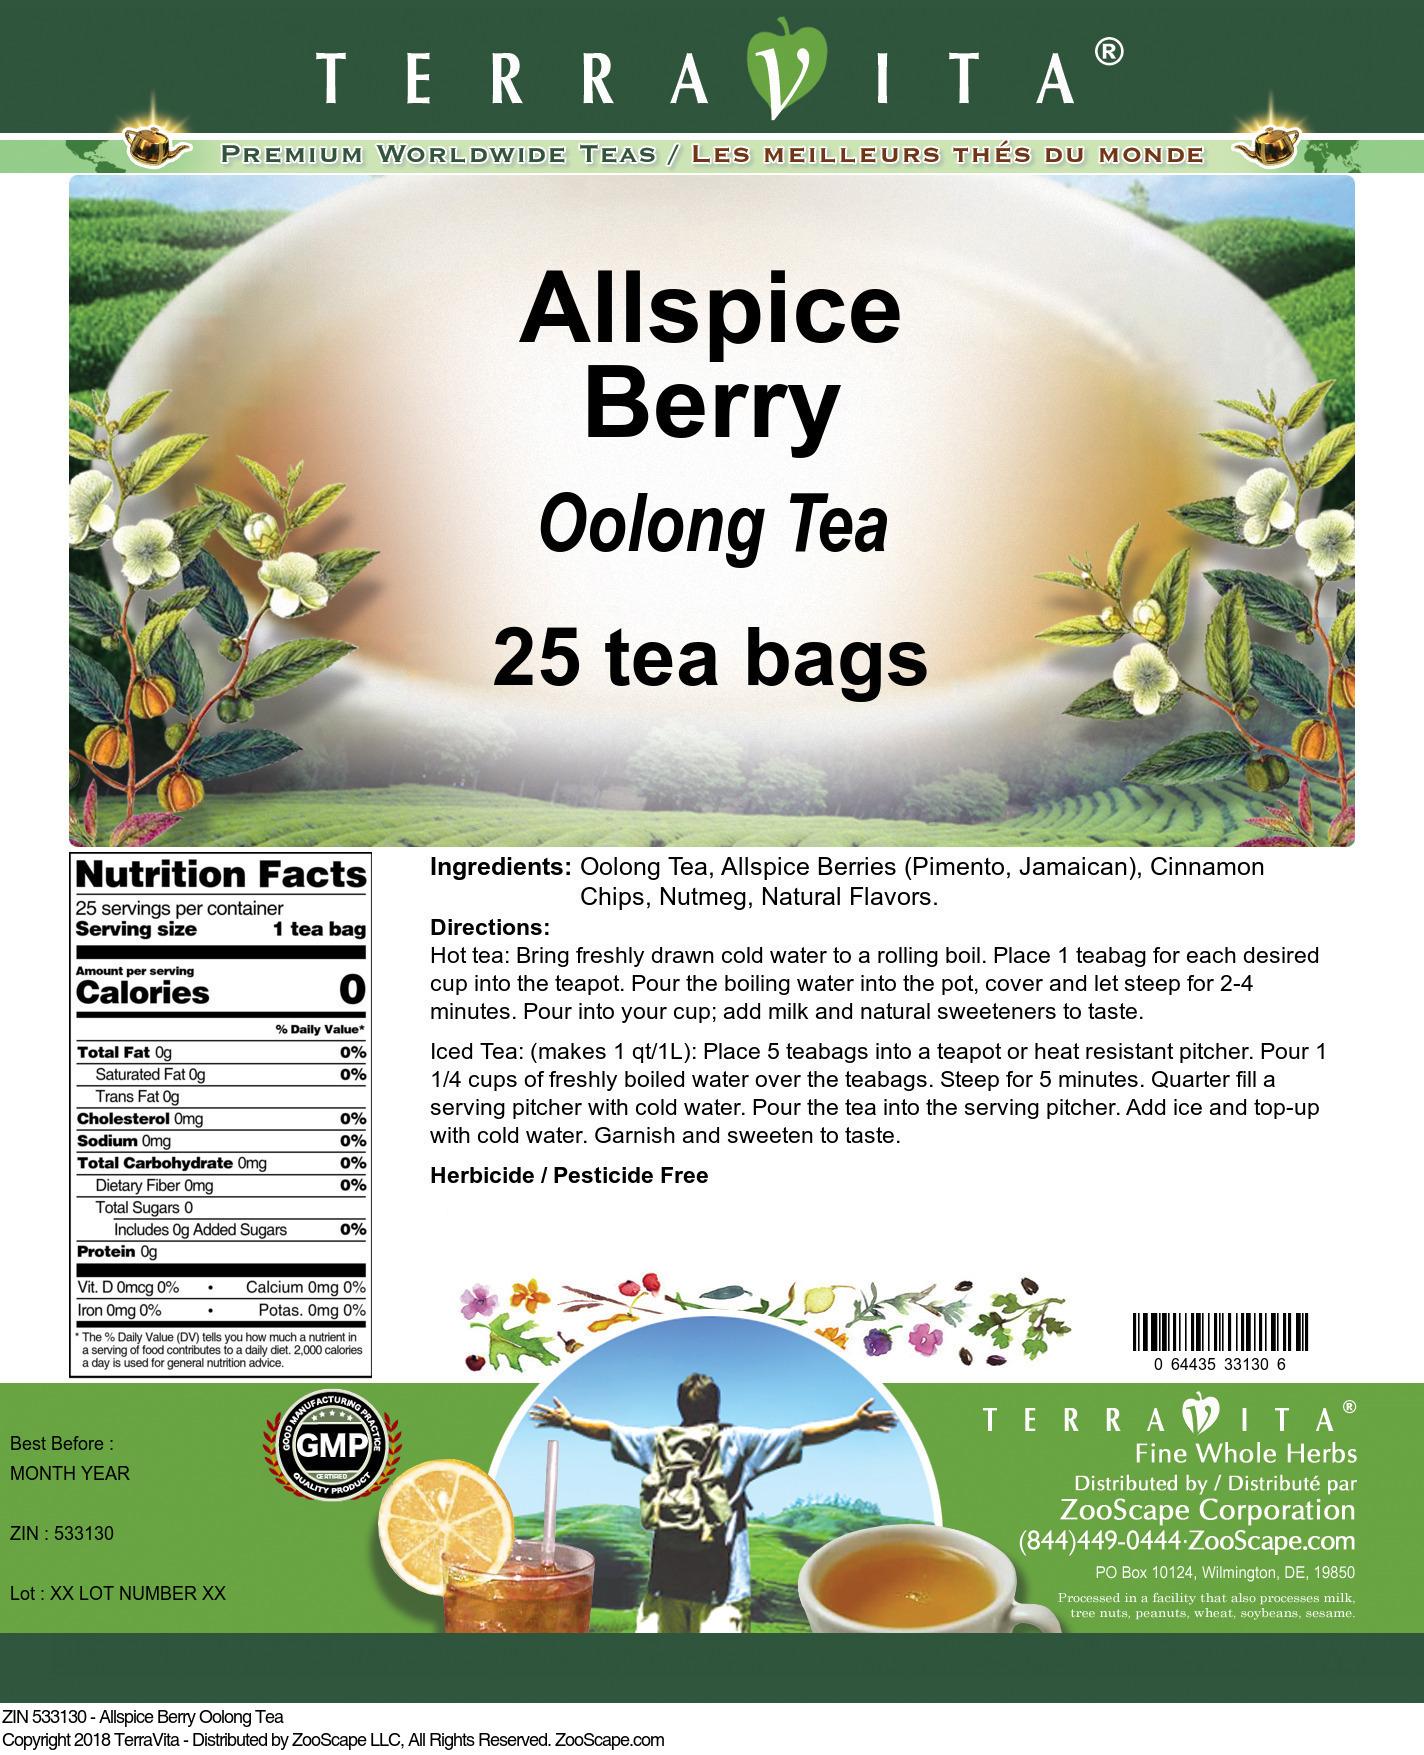 Allspice Berry Oolong Tea